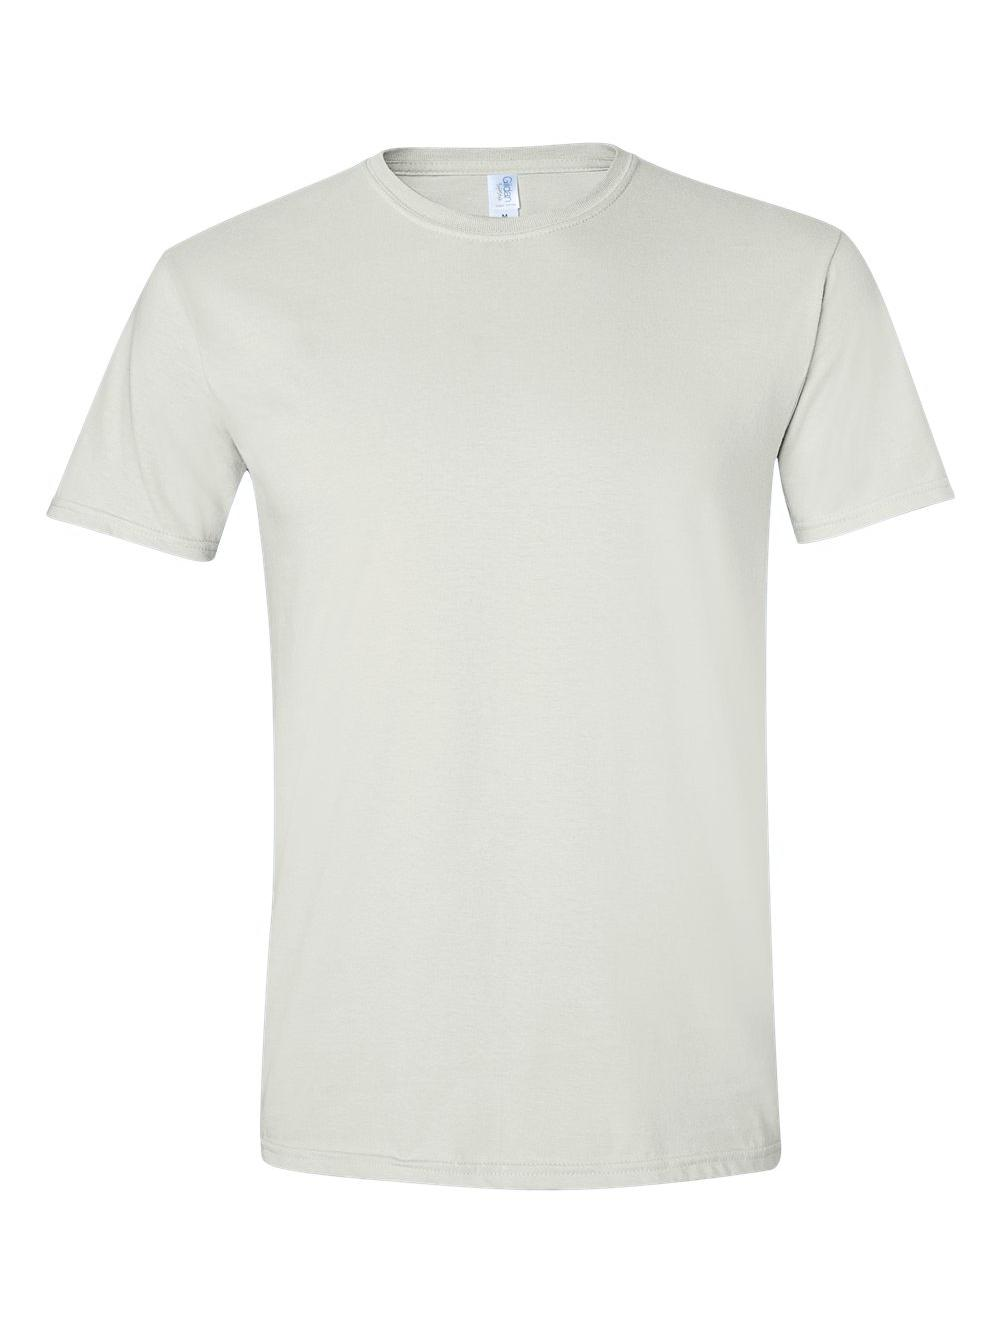 Gildan-Softstyle-T-Shirt-64000 thumbnail 168